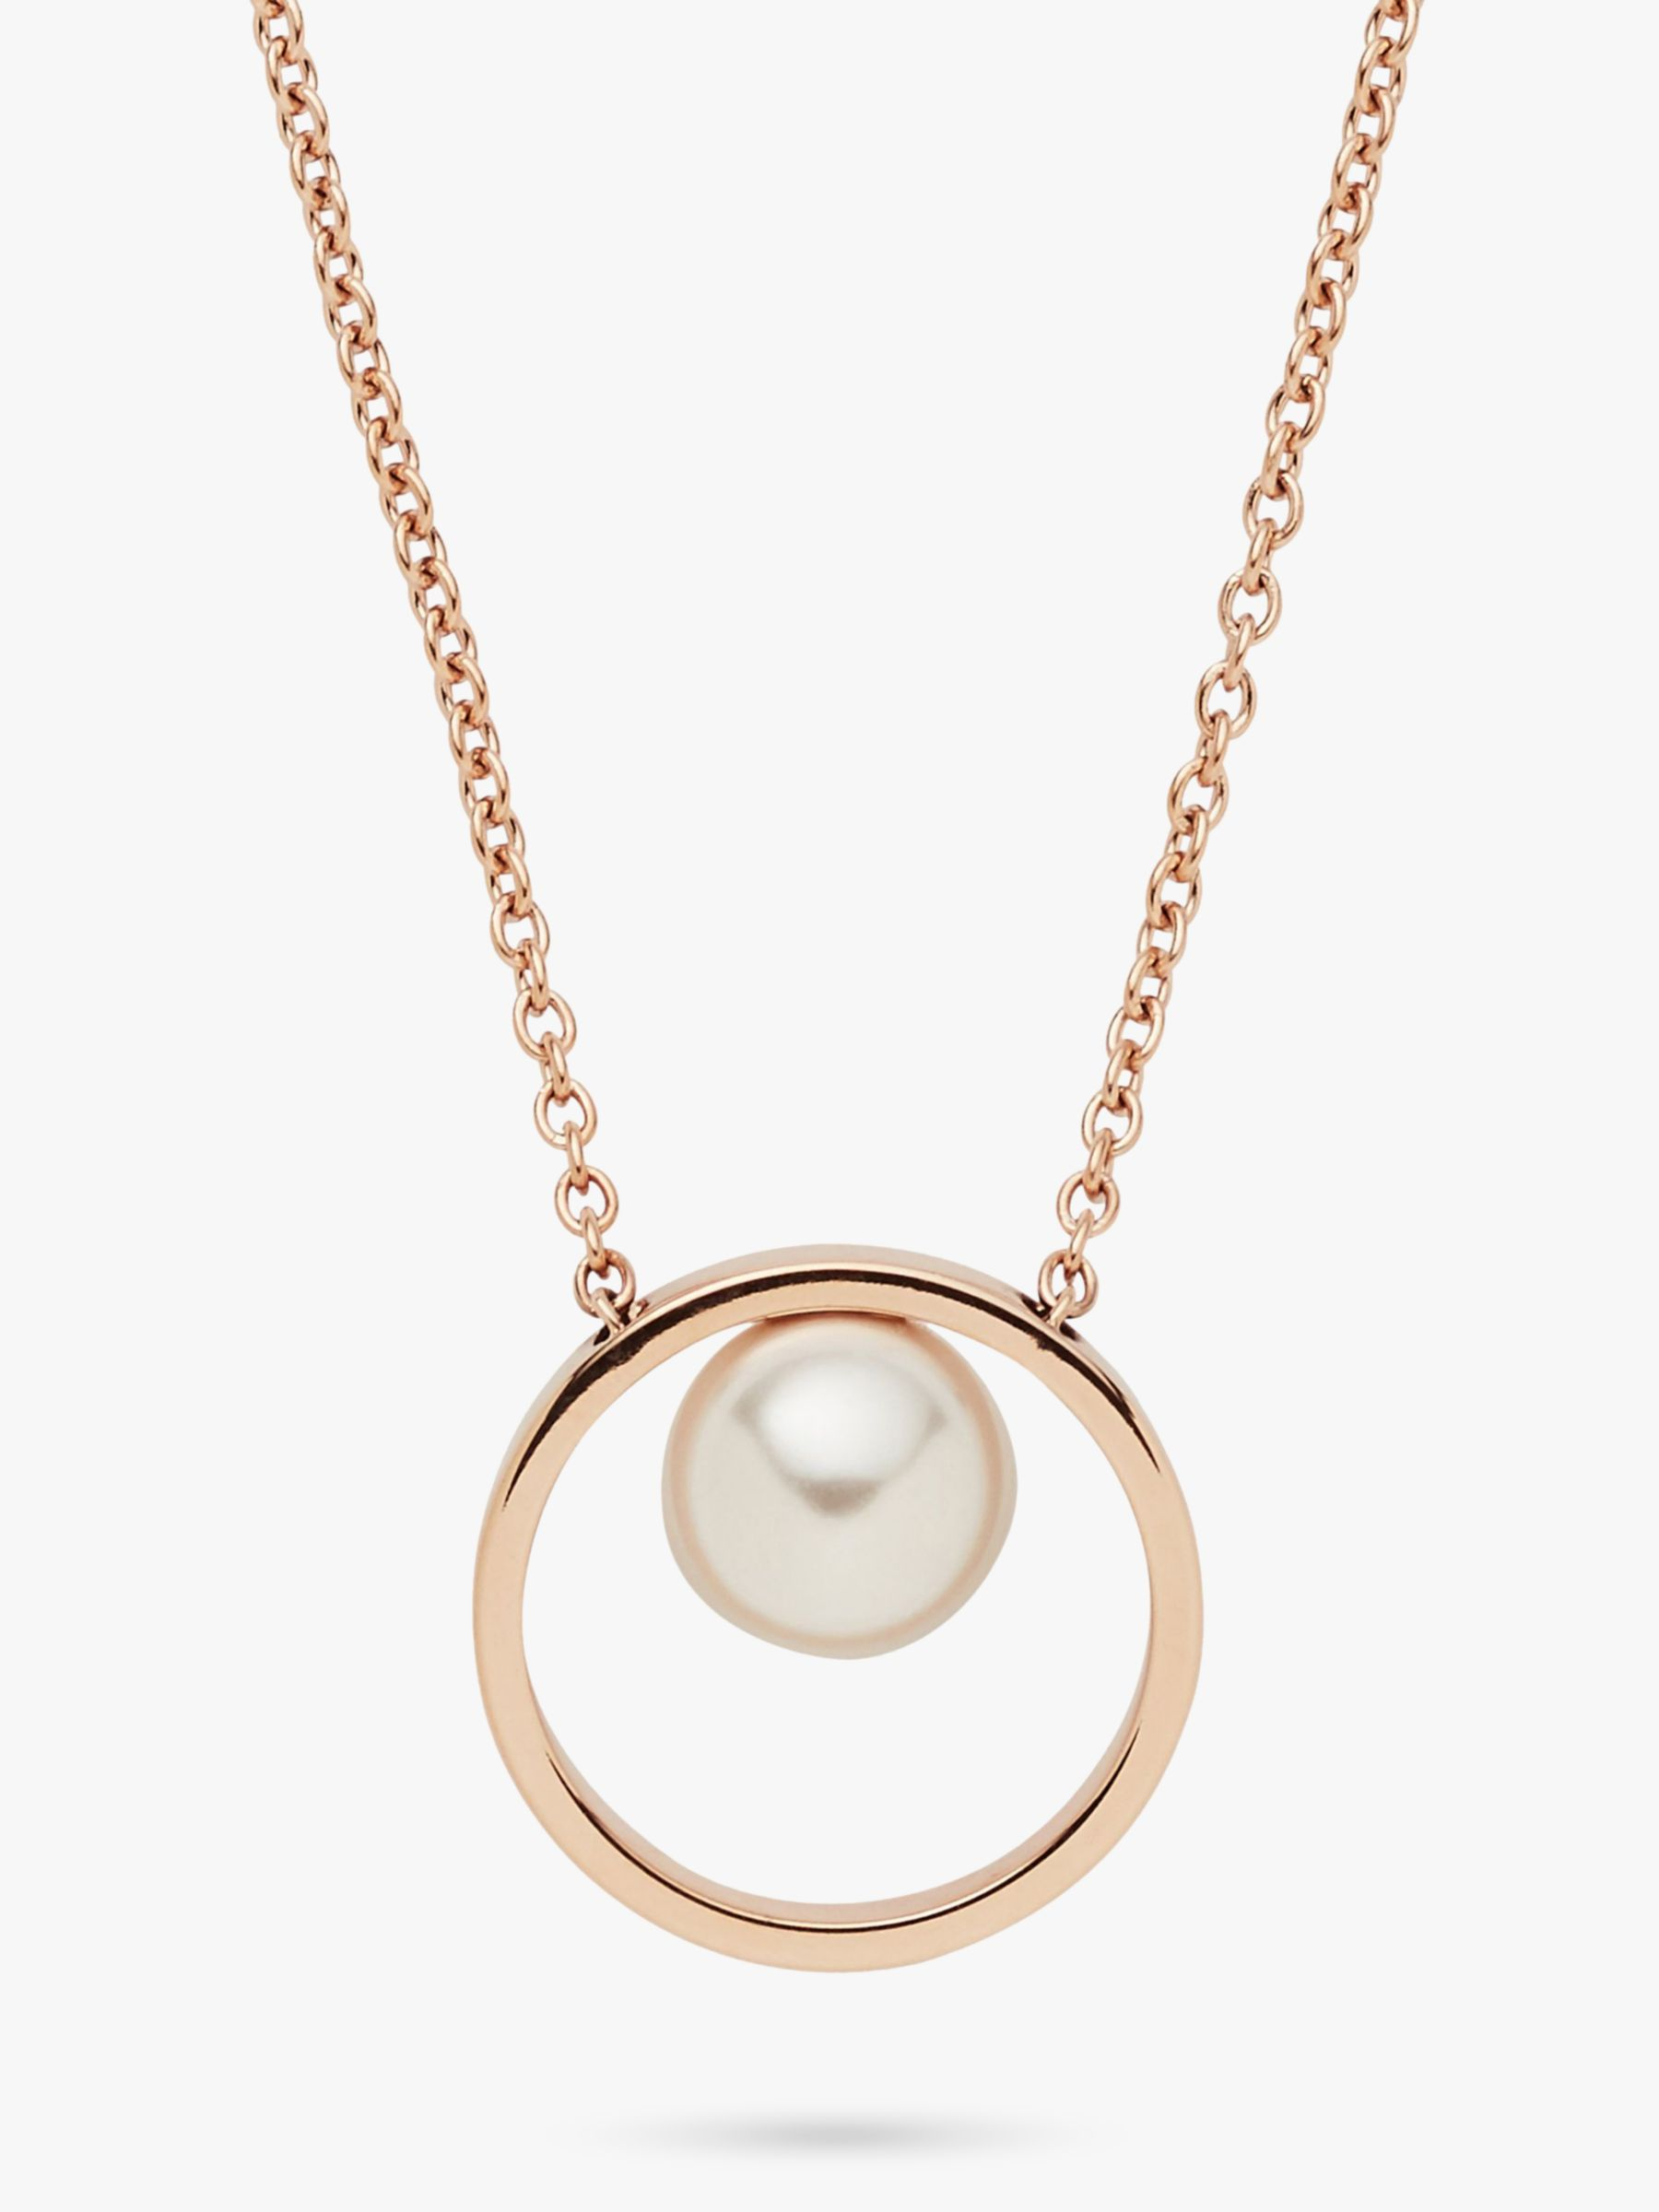 skagen Skagen Agnethe Faux Pearl Circle Pendant Necklace, Rose Gold SKJ0996791